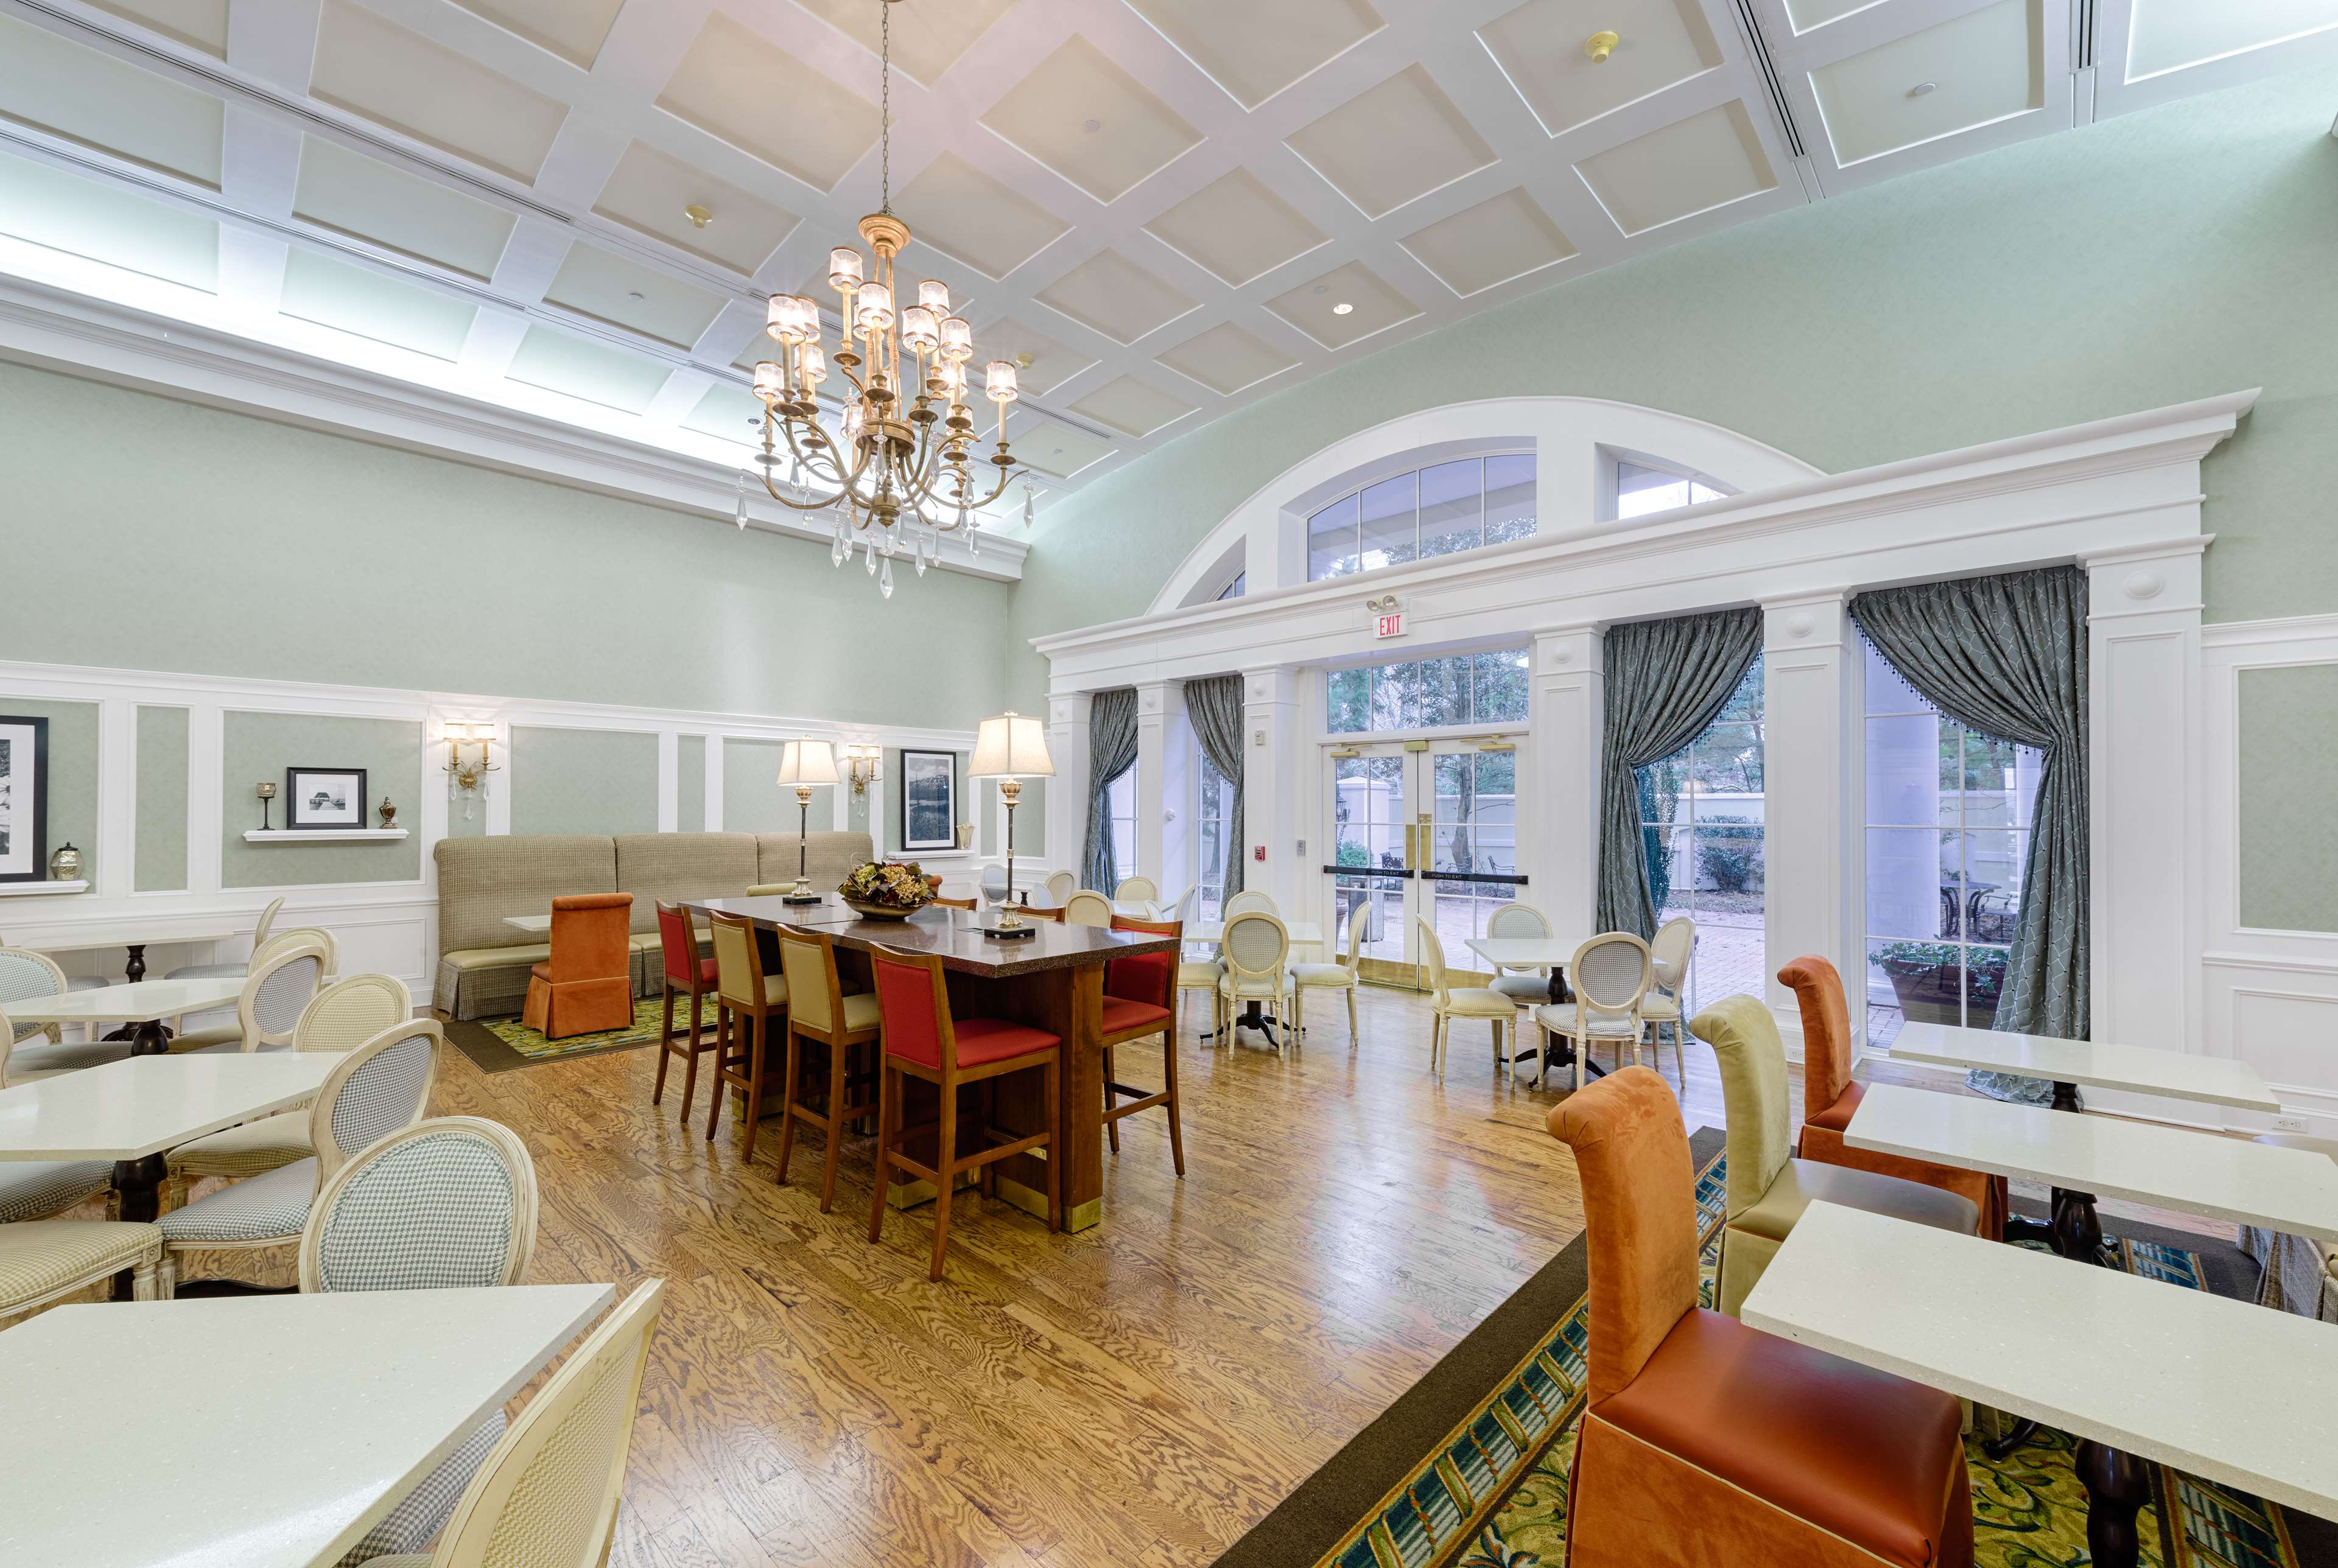 Hampton Inn & Suites Charlotte/South Park at Phillips Place image 12